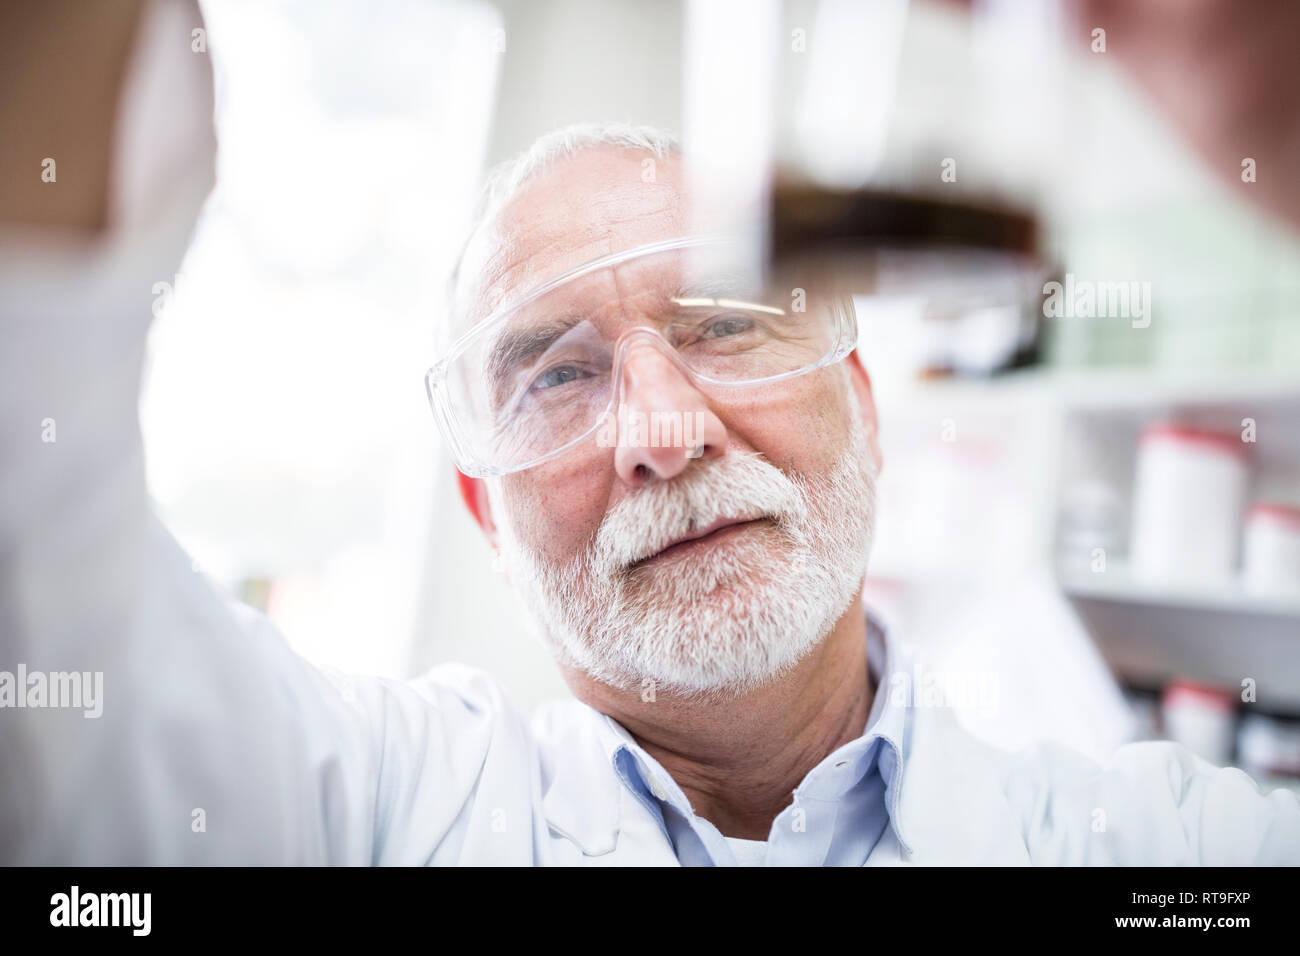 Man looking at beaker in laboratory - Stock Image